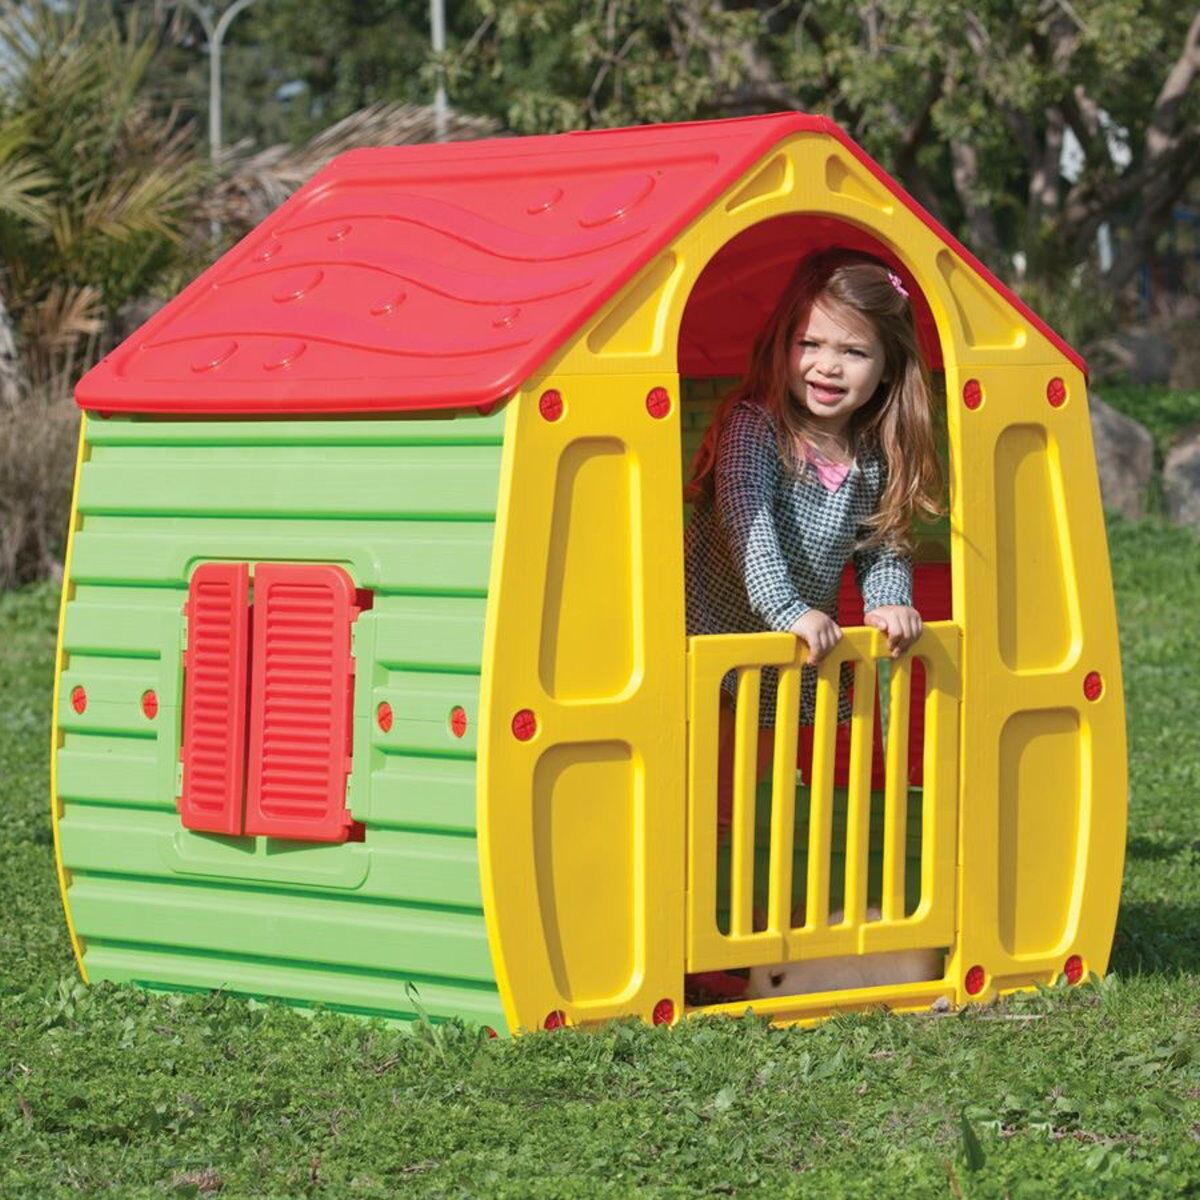 Kinderspielhaus Spielhaus Kinderhaus Kinder Spiel Garten Haus Gartenhaus bunt